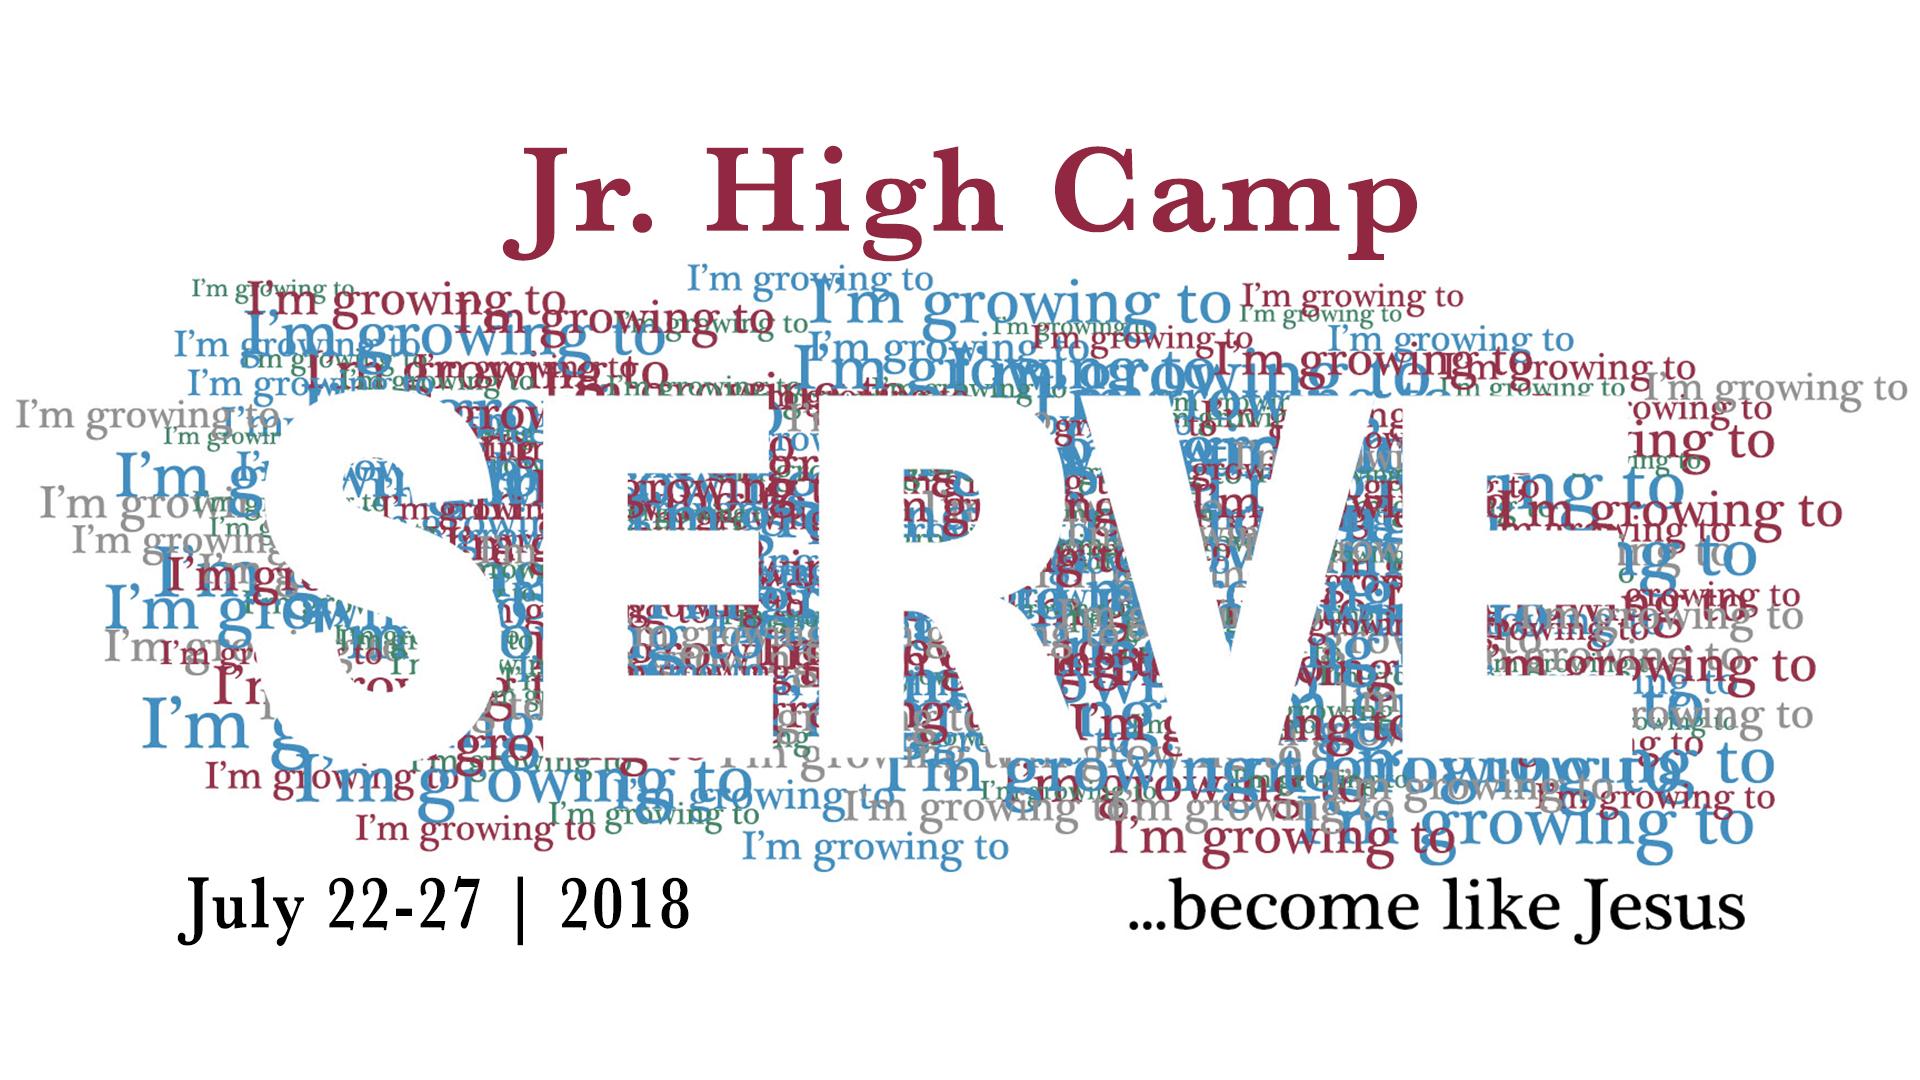 Jrhighcamp graphic